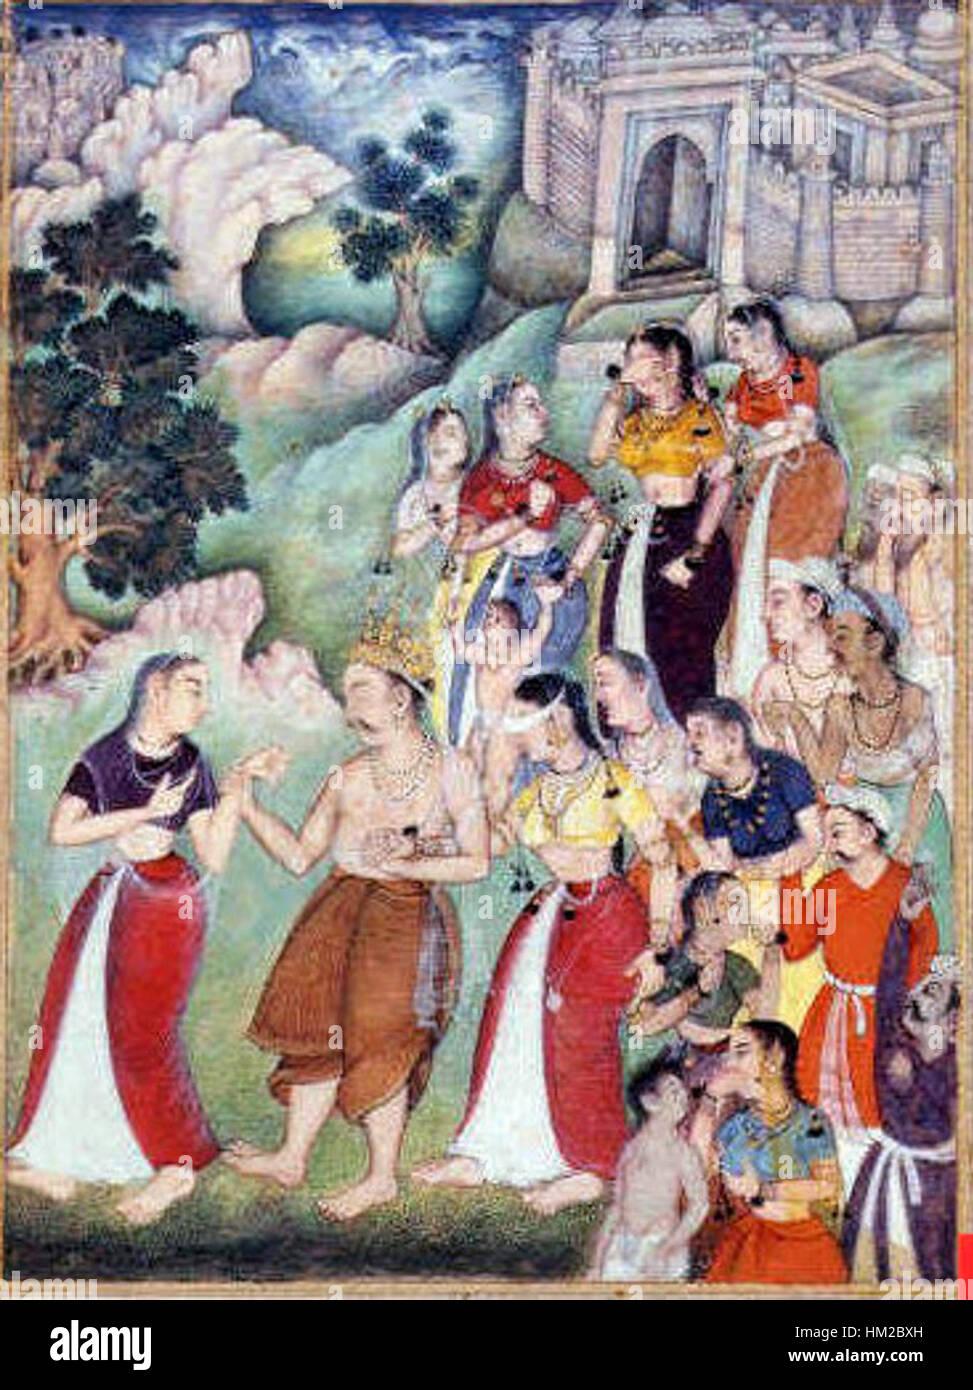 Image result for gandhari kunti